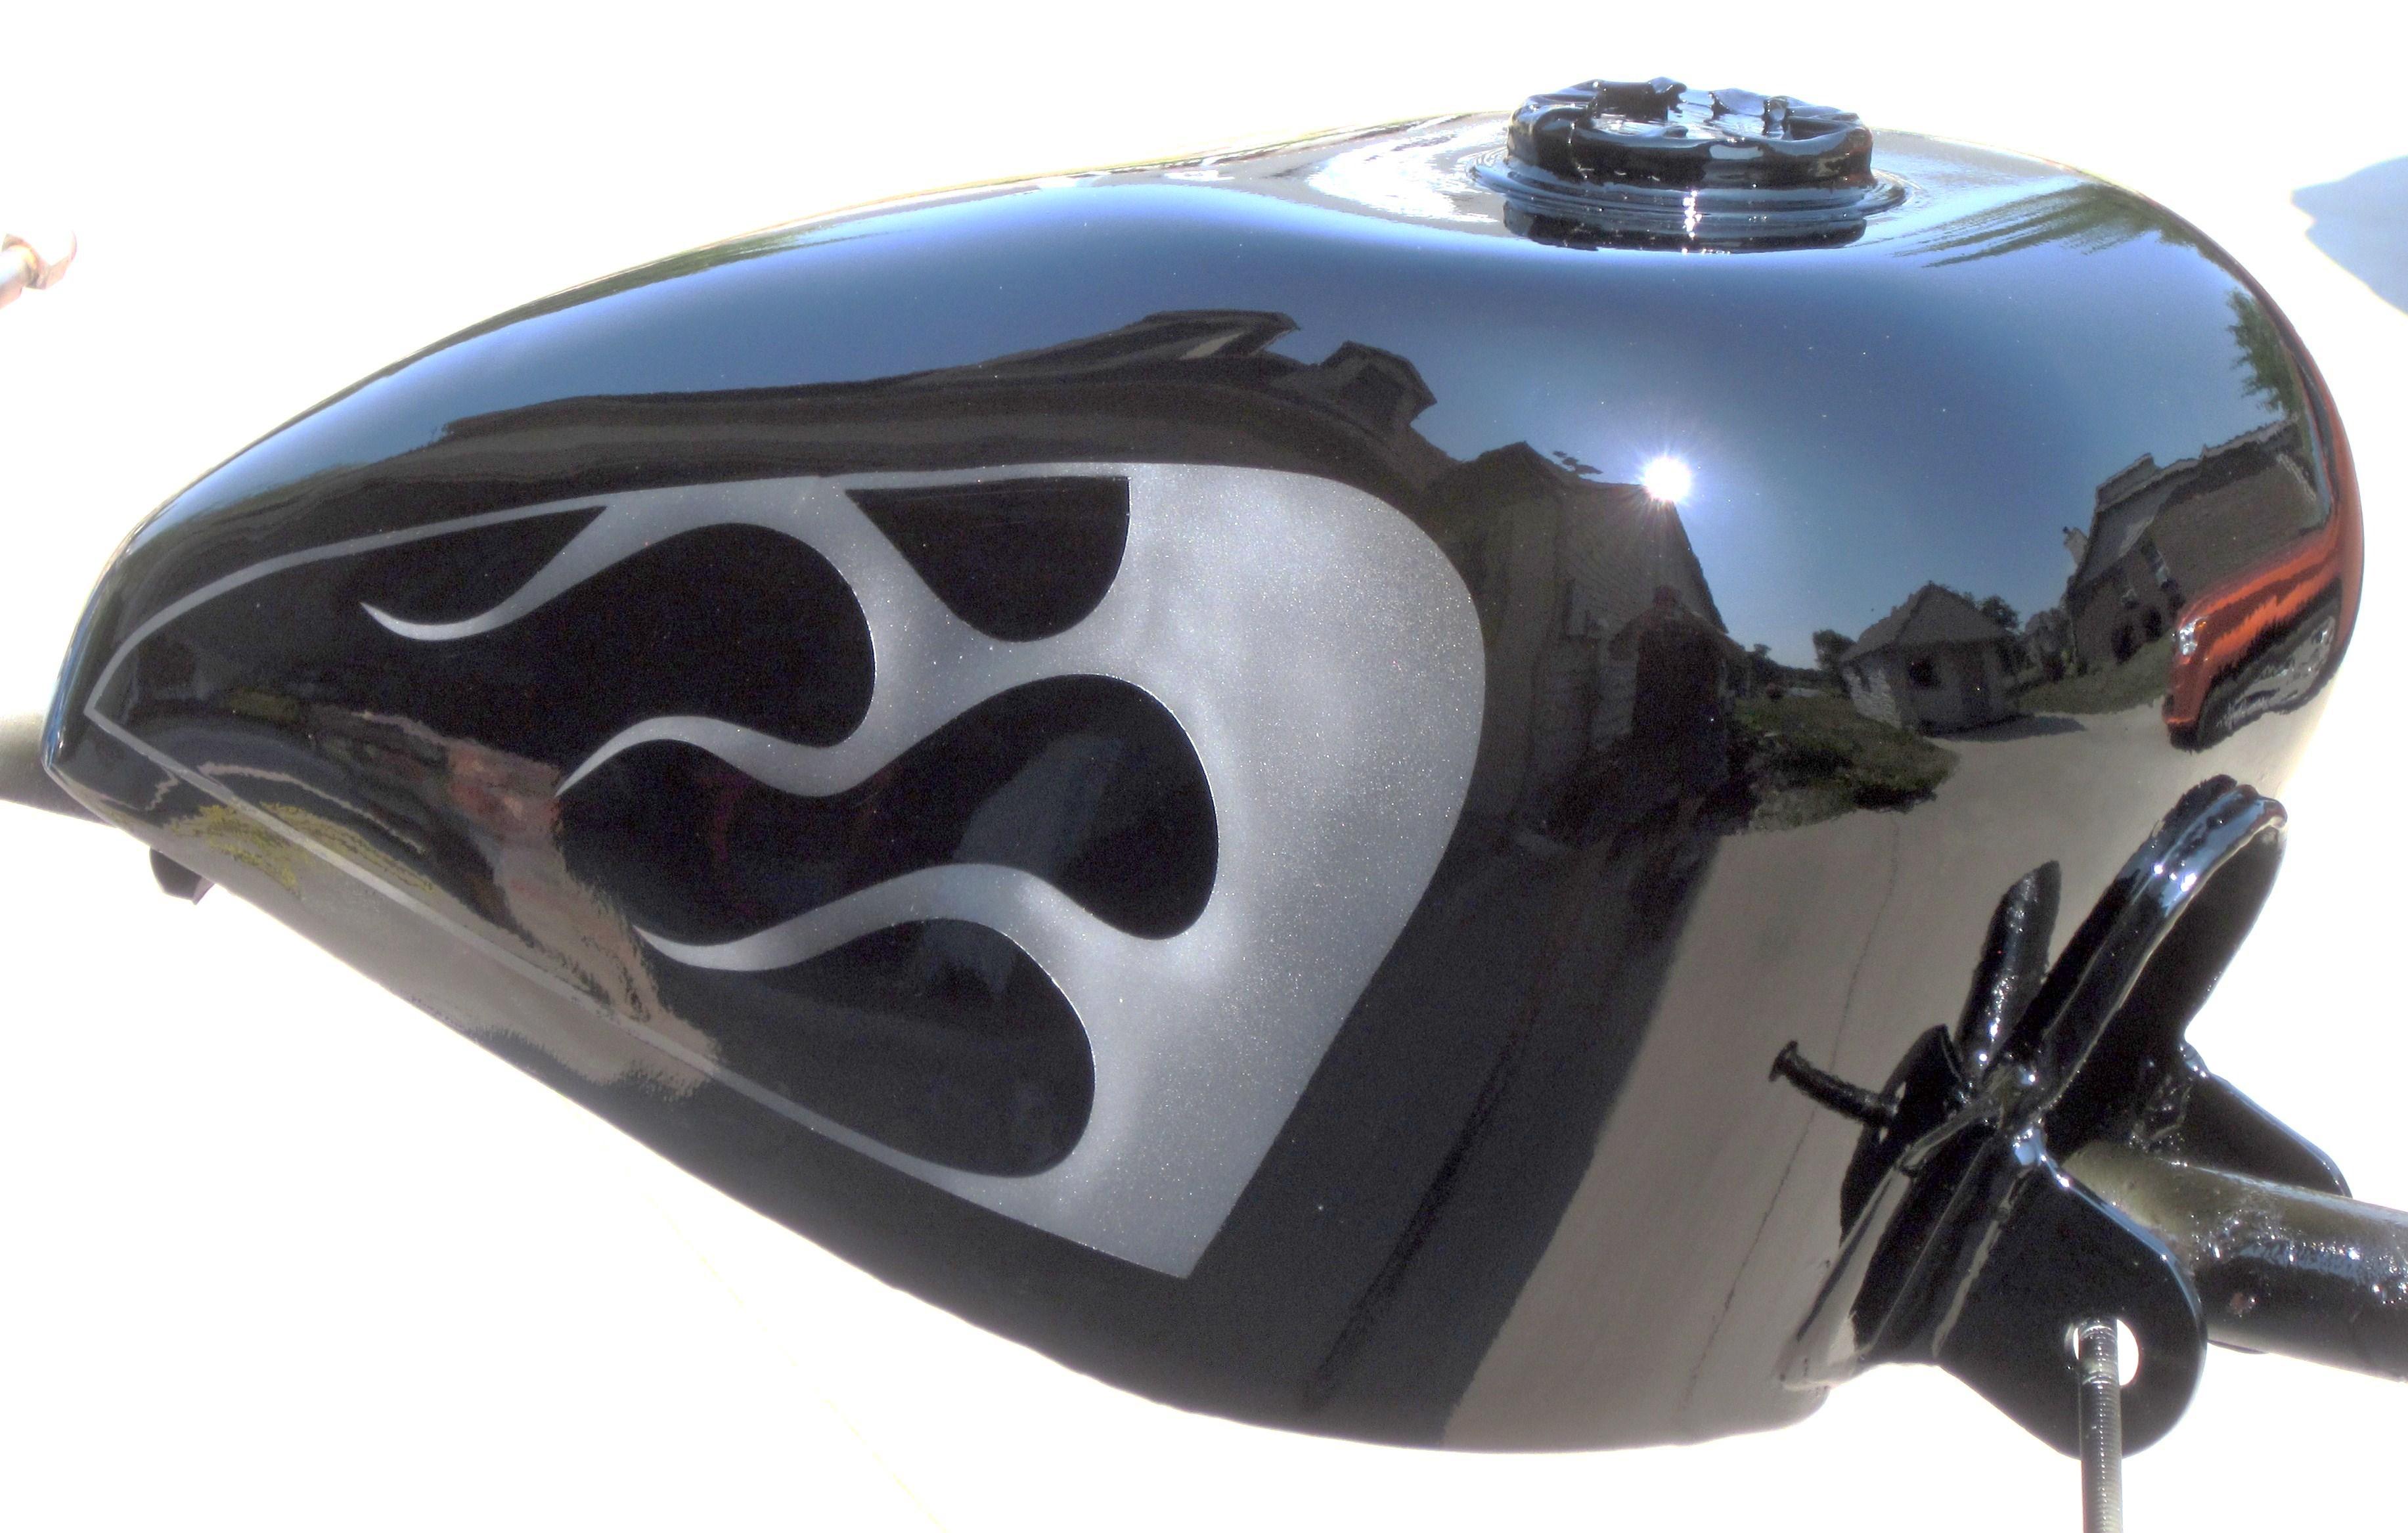 Click image for larger version  Name:bike, tank, paint gun 015.JPG Views:103 Size:1.05 MB ID:67149